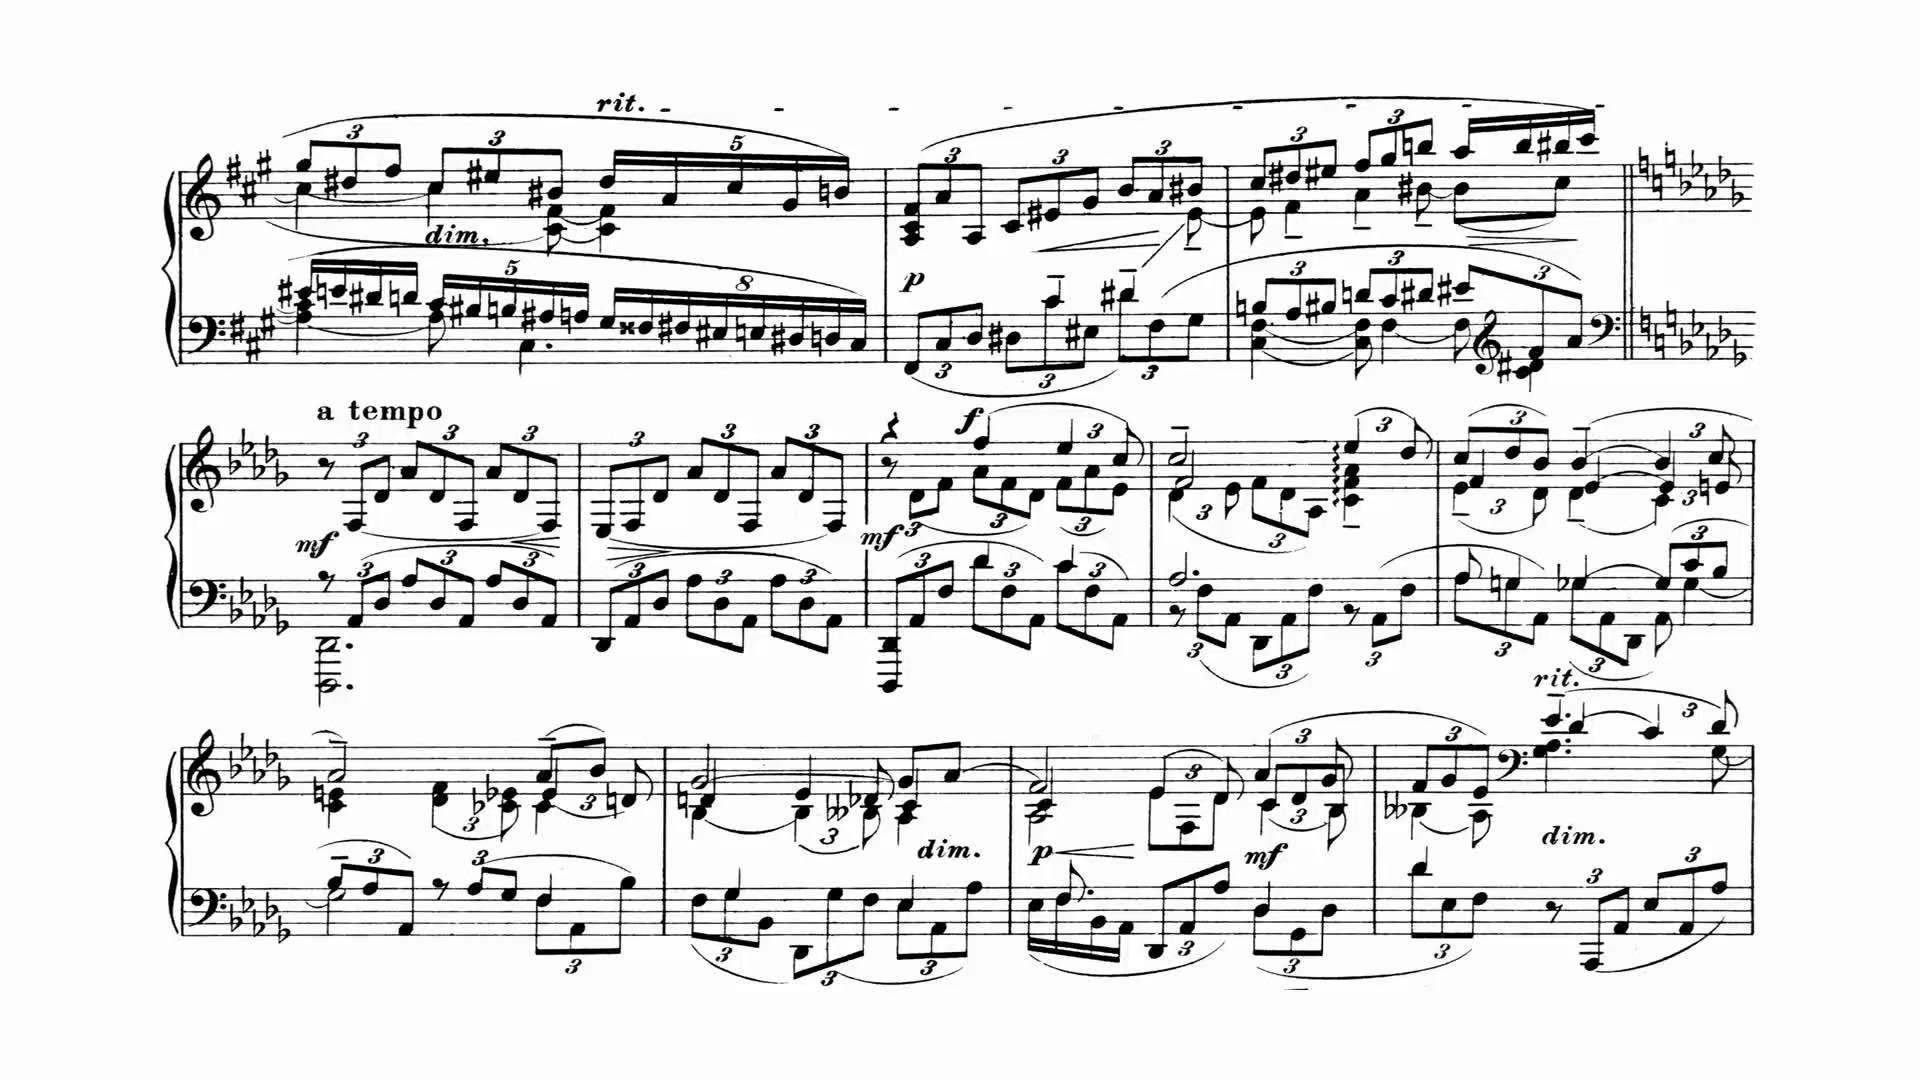 Rachmaninoff Piano Concerto 3 Weissenberg 1968 With Score Rachmaninoff Classical Music Piano